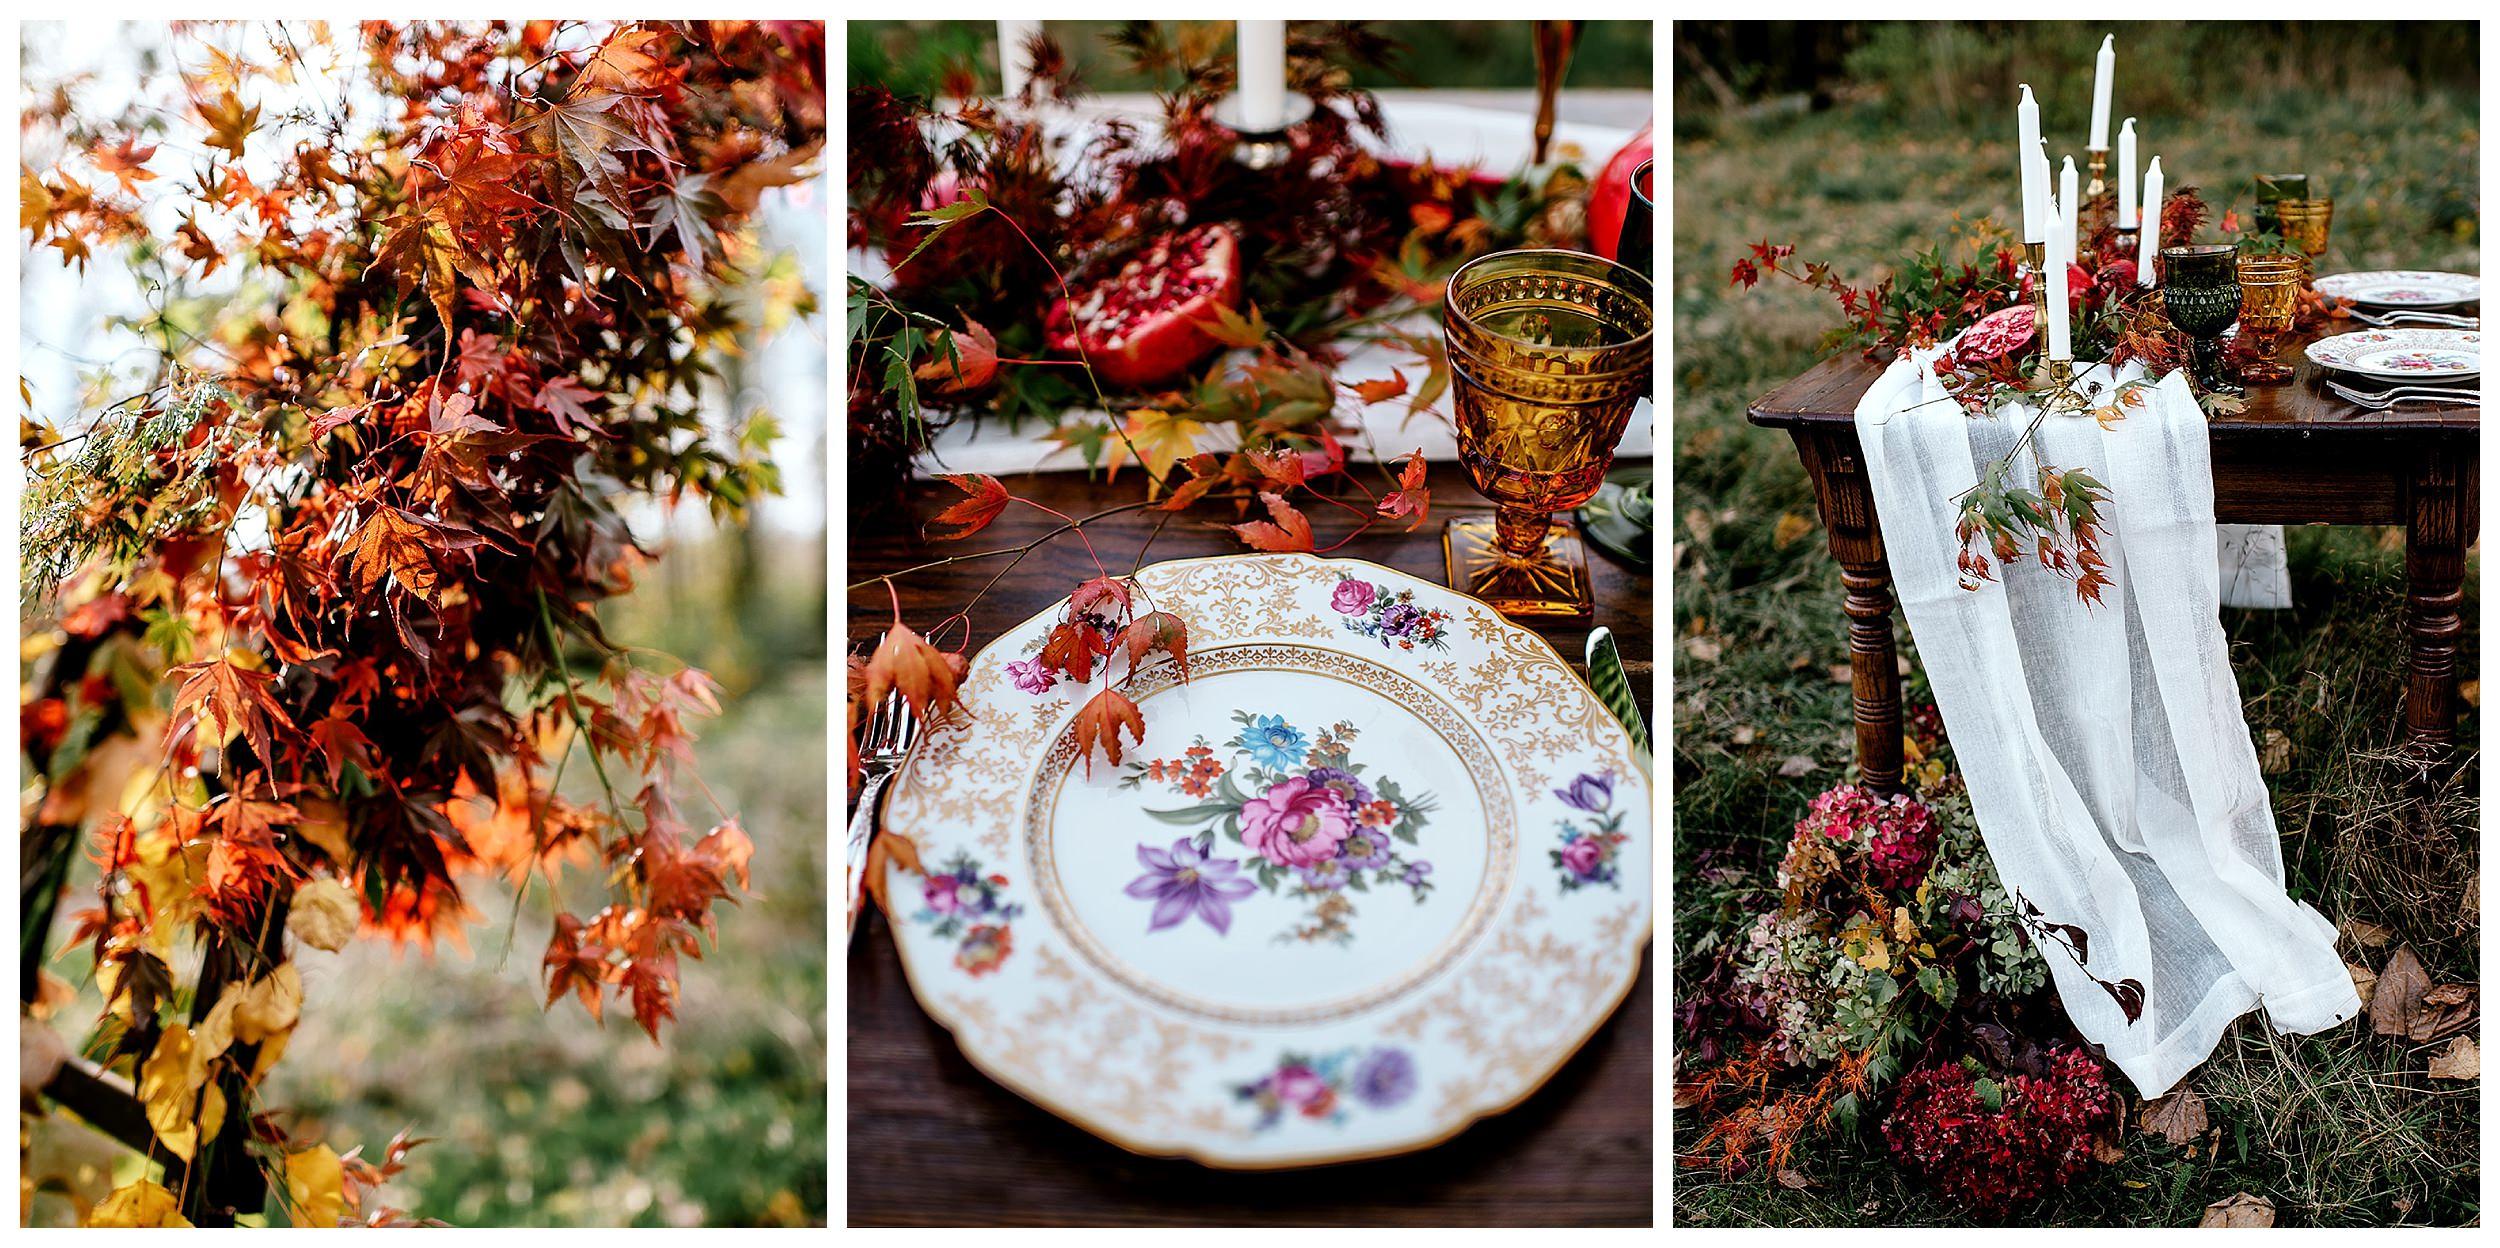 Portland-elopement-photographer-Autunm-wedding-inspiration-01.jpg